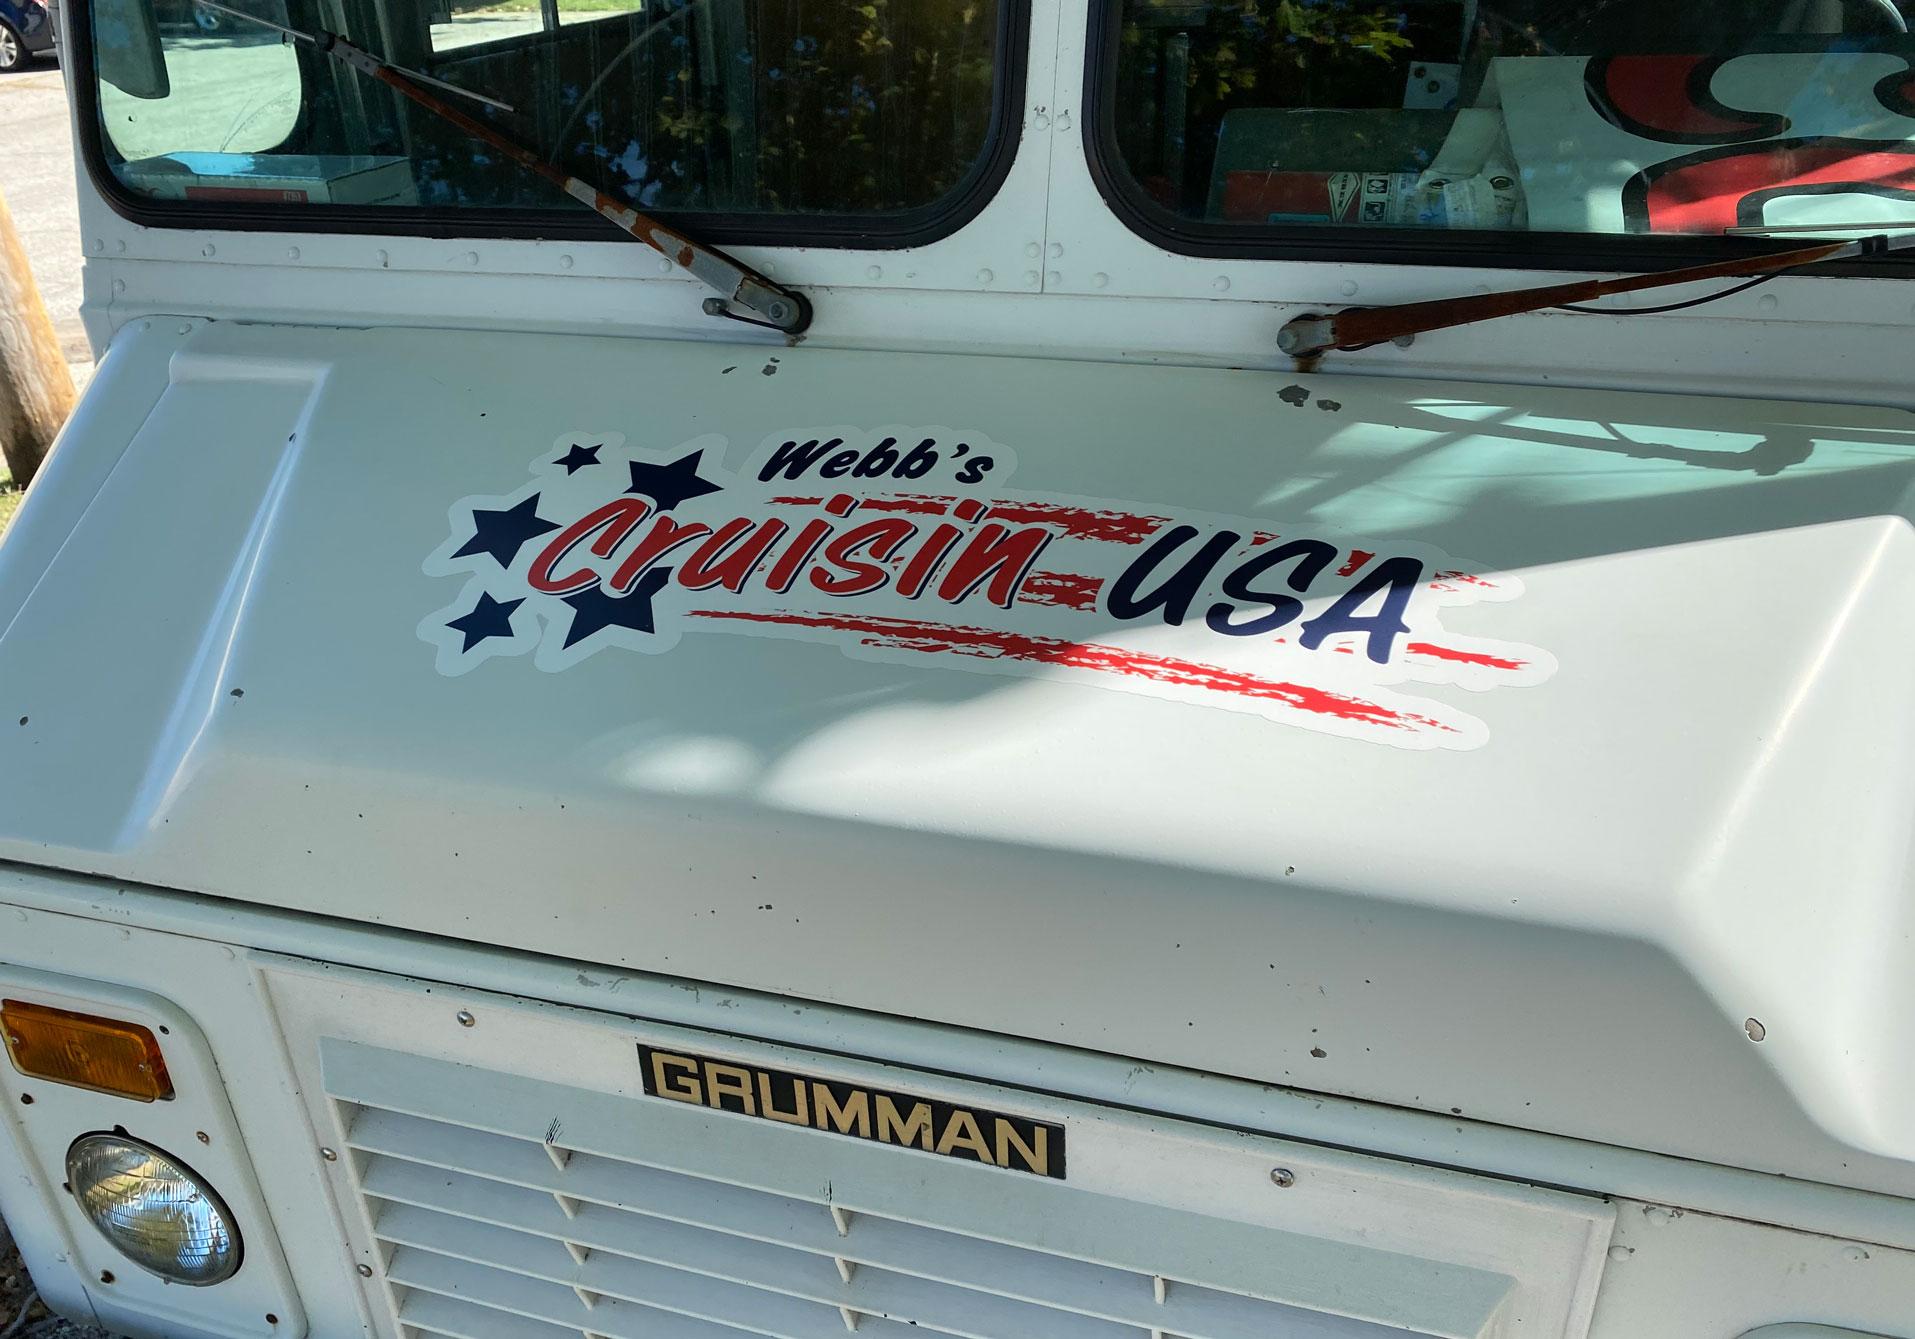 Webb's Cruisin USA